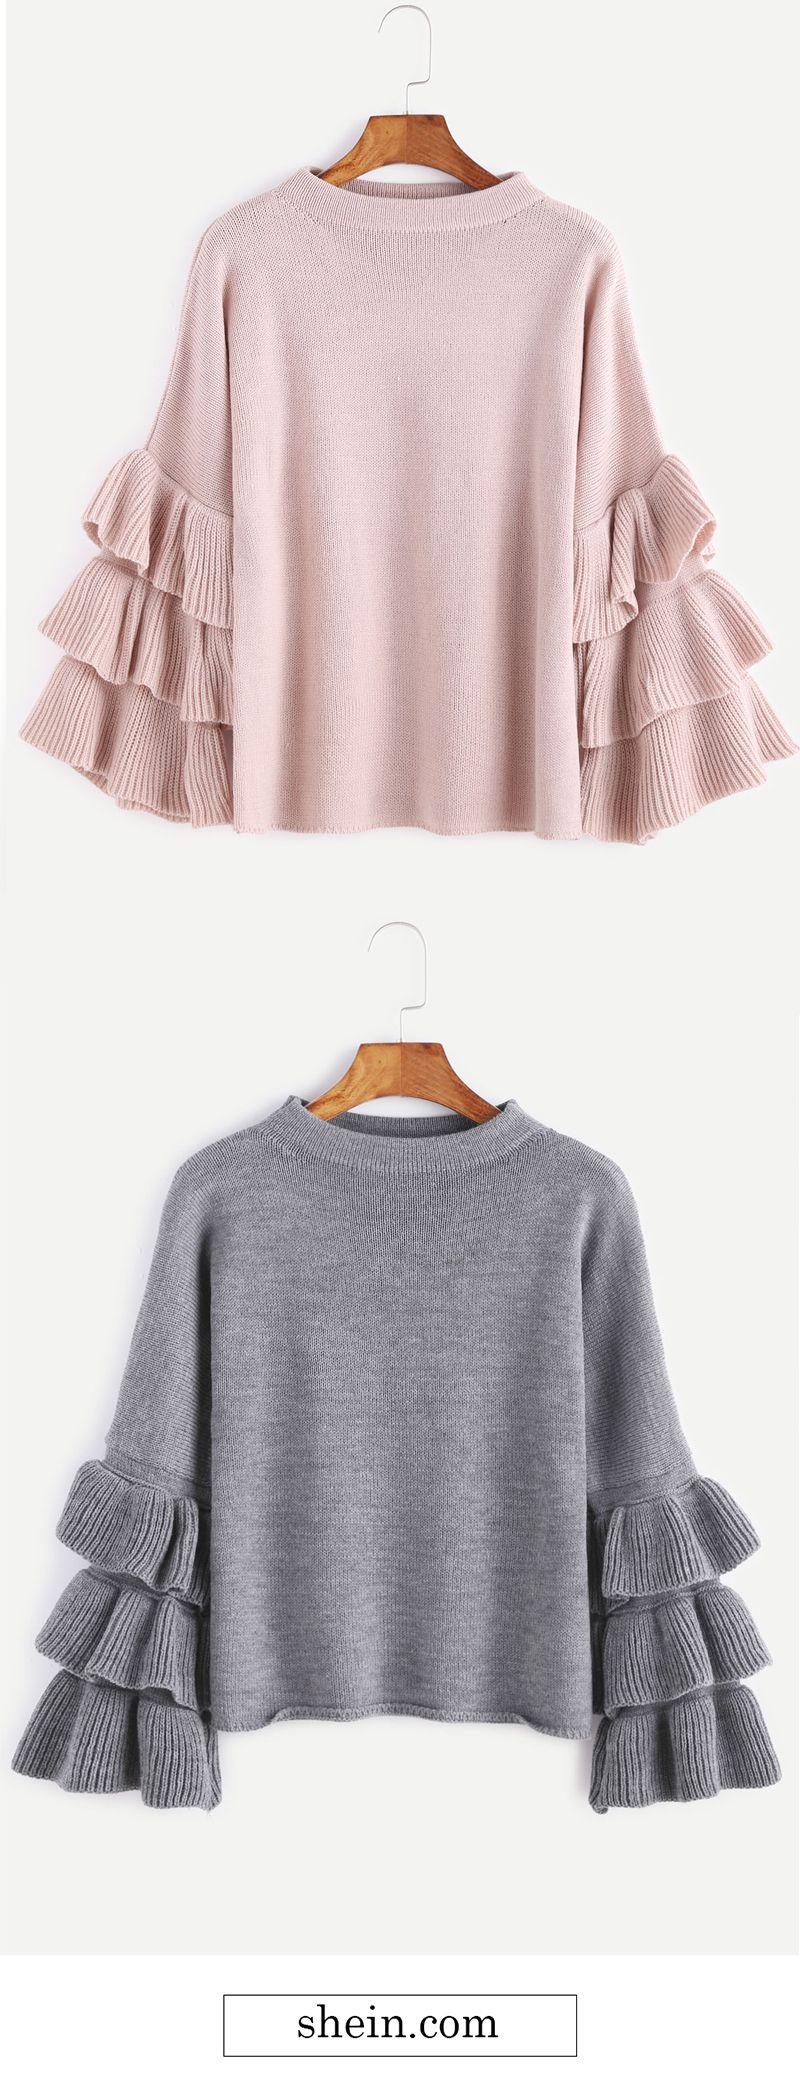 Cute layered ruffle sleeve sweater collect. | Spotlights ...